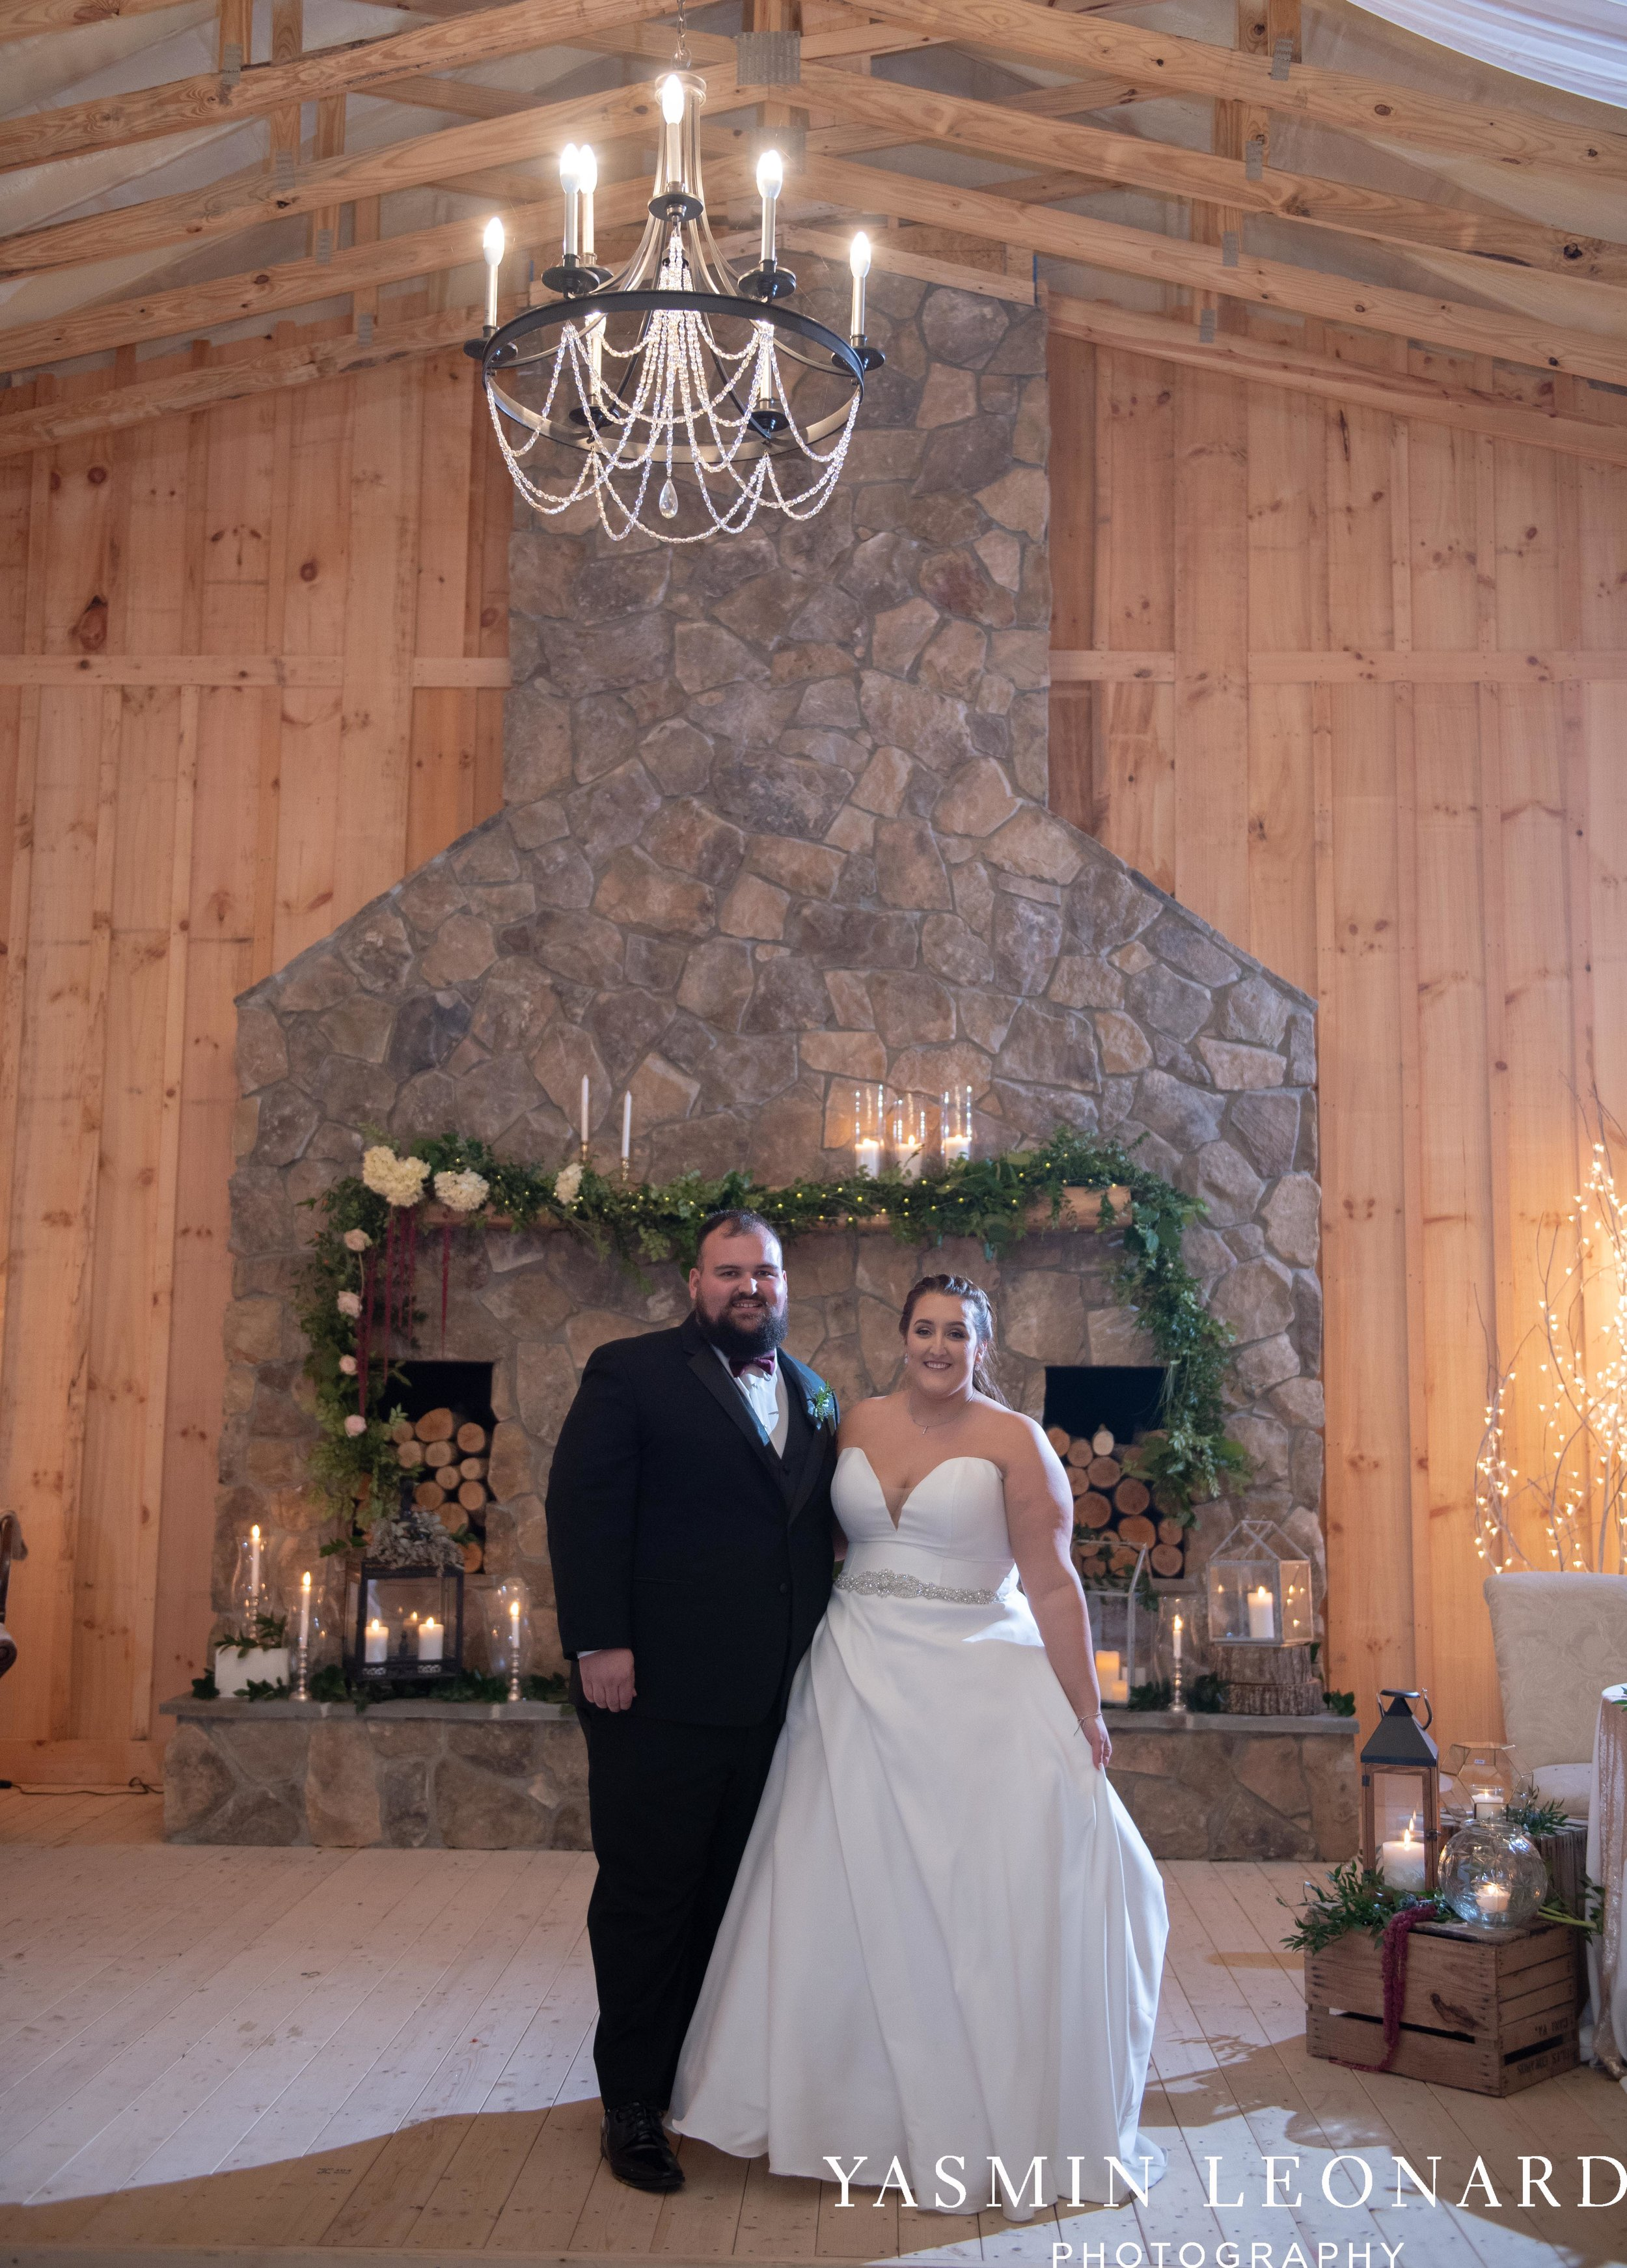 Wesley Memorial United Methodist Church - Old Homeplace Winery - High Point Weddings - High Point Wedding Photographer - NC Weddings - NC Barn Venue - Yasmin Leonard Photography-67.jpg